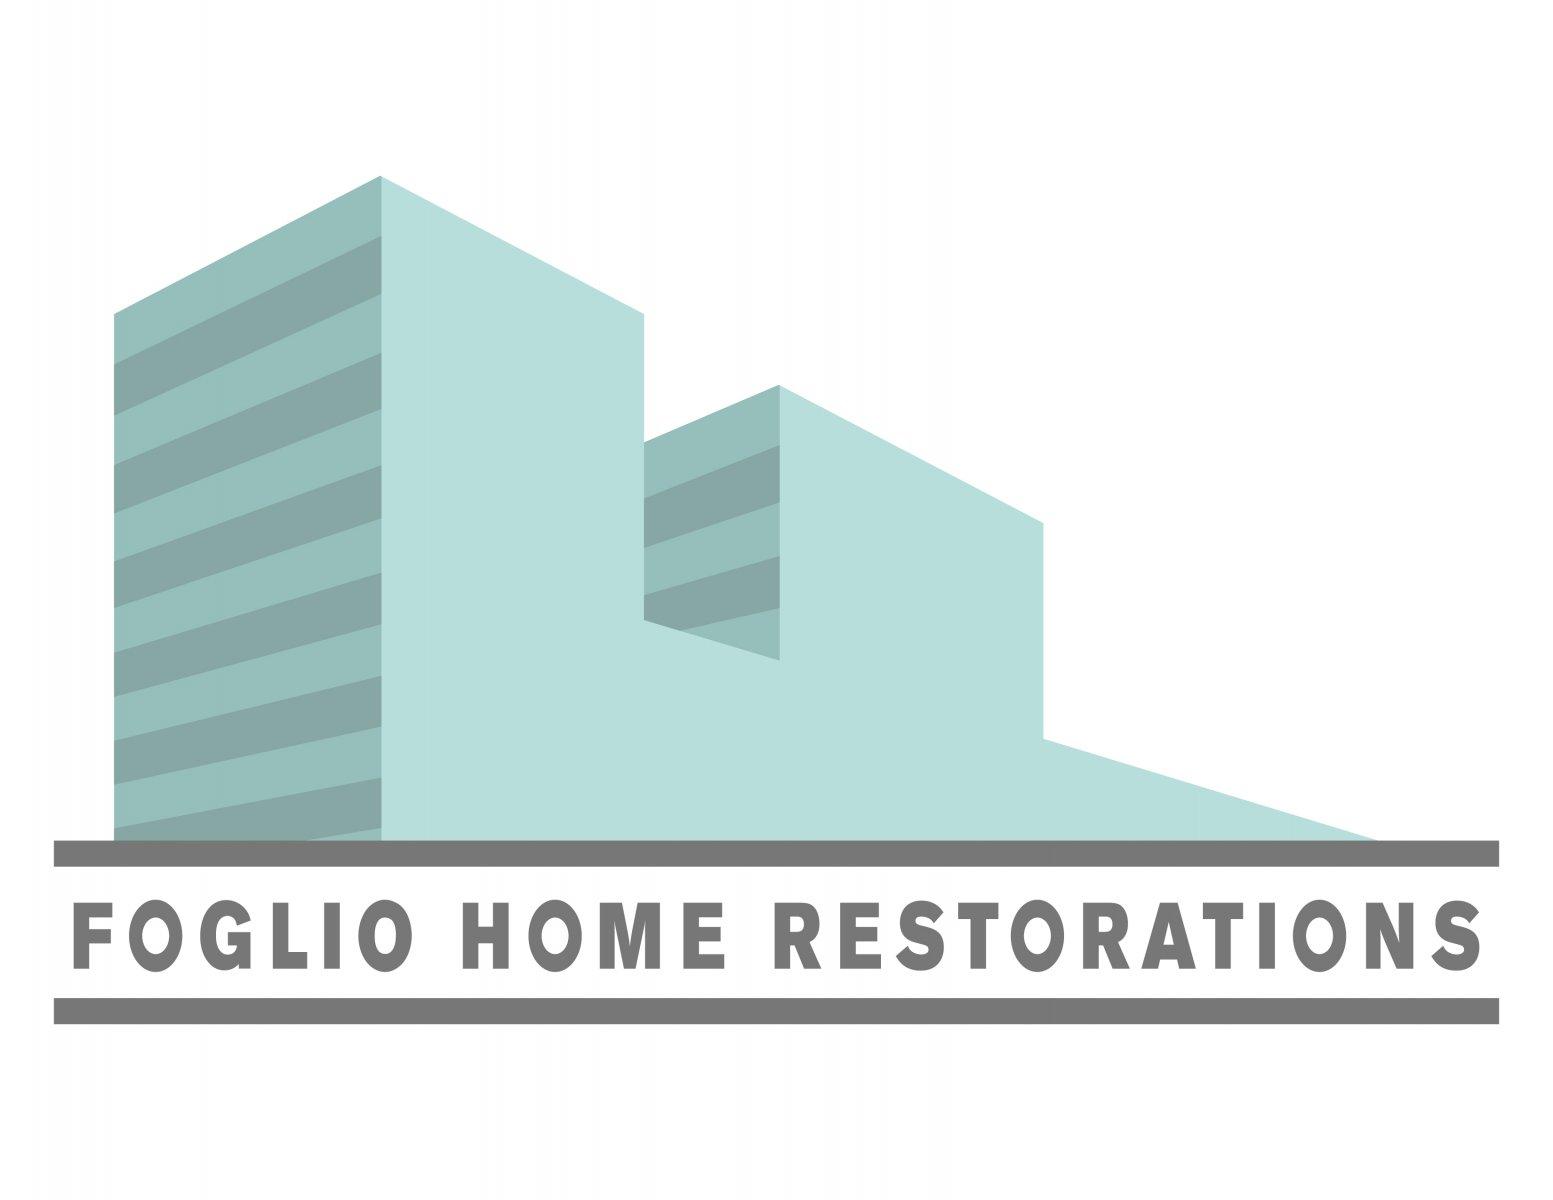 FOGLIO HOME RESTORATIONS logo